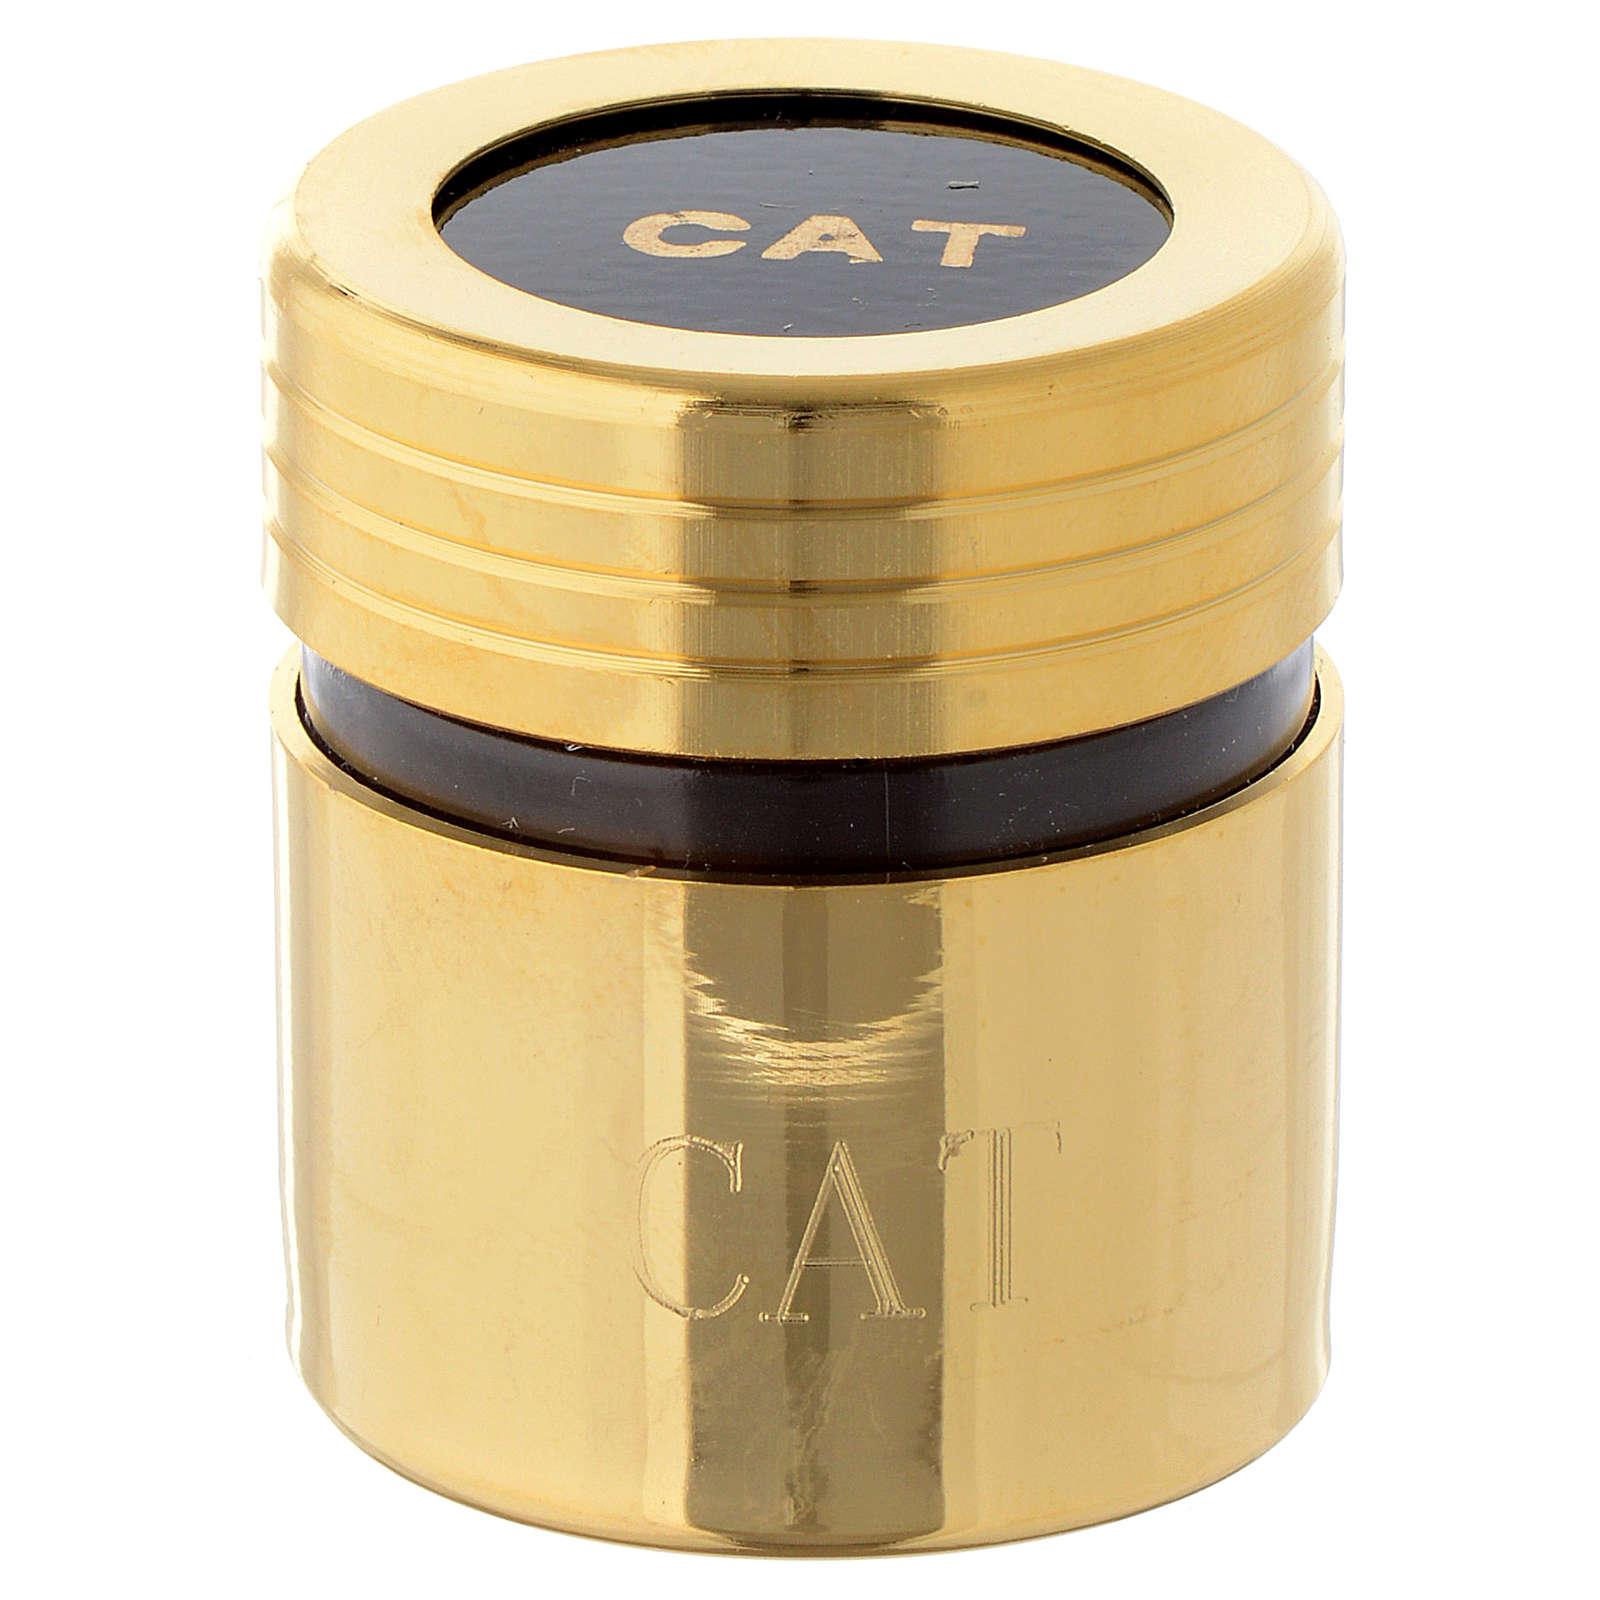 Vasetto in pvc corazza dorata olio catecumeni 3